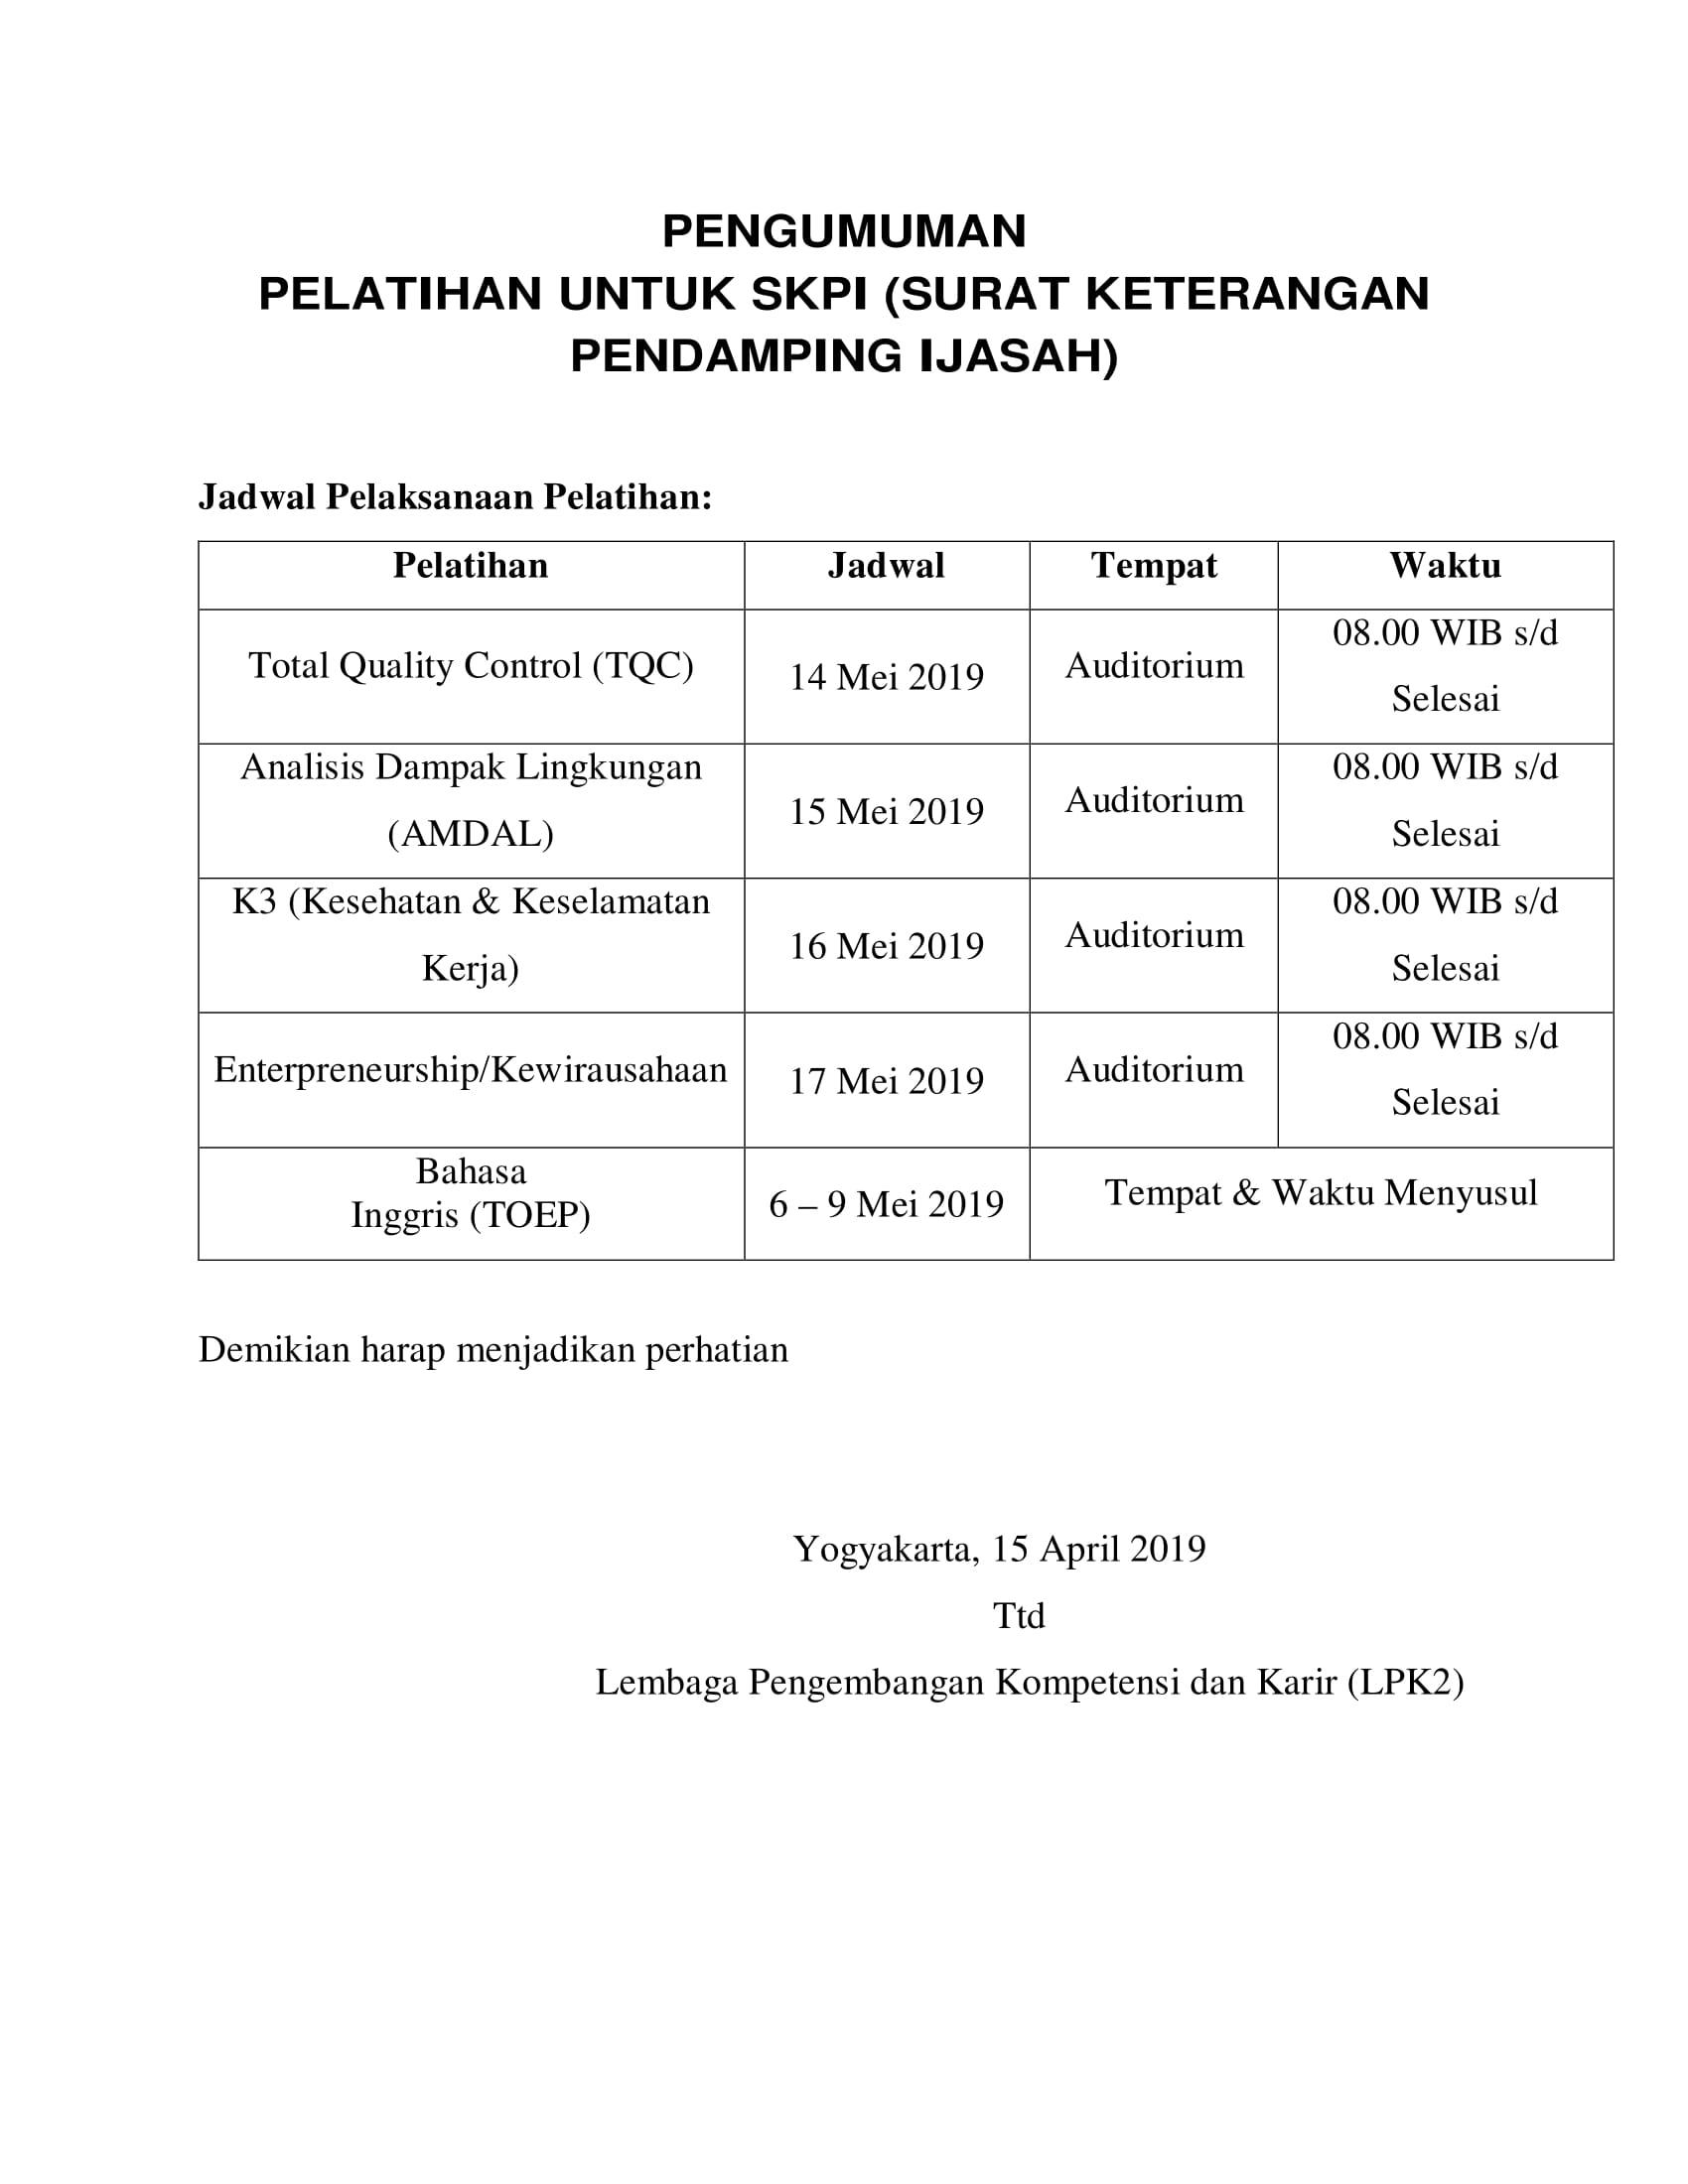 Perubahan Jadwal Pelaksanaan SKPI 2019